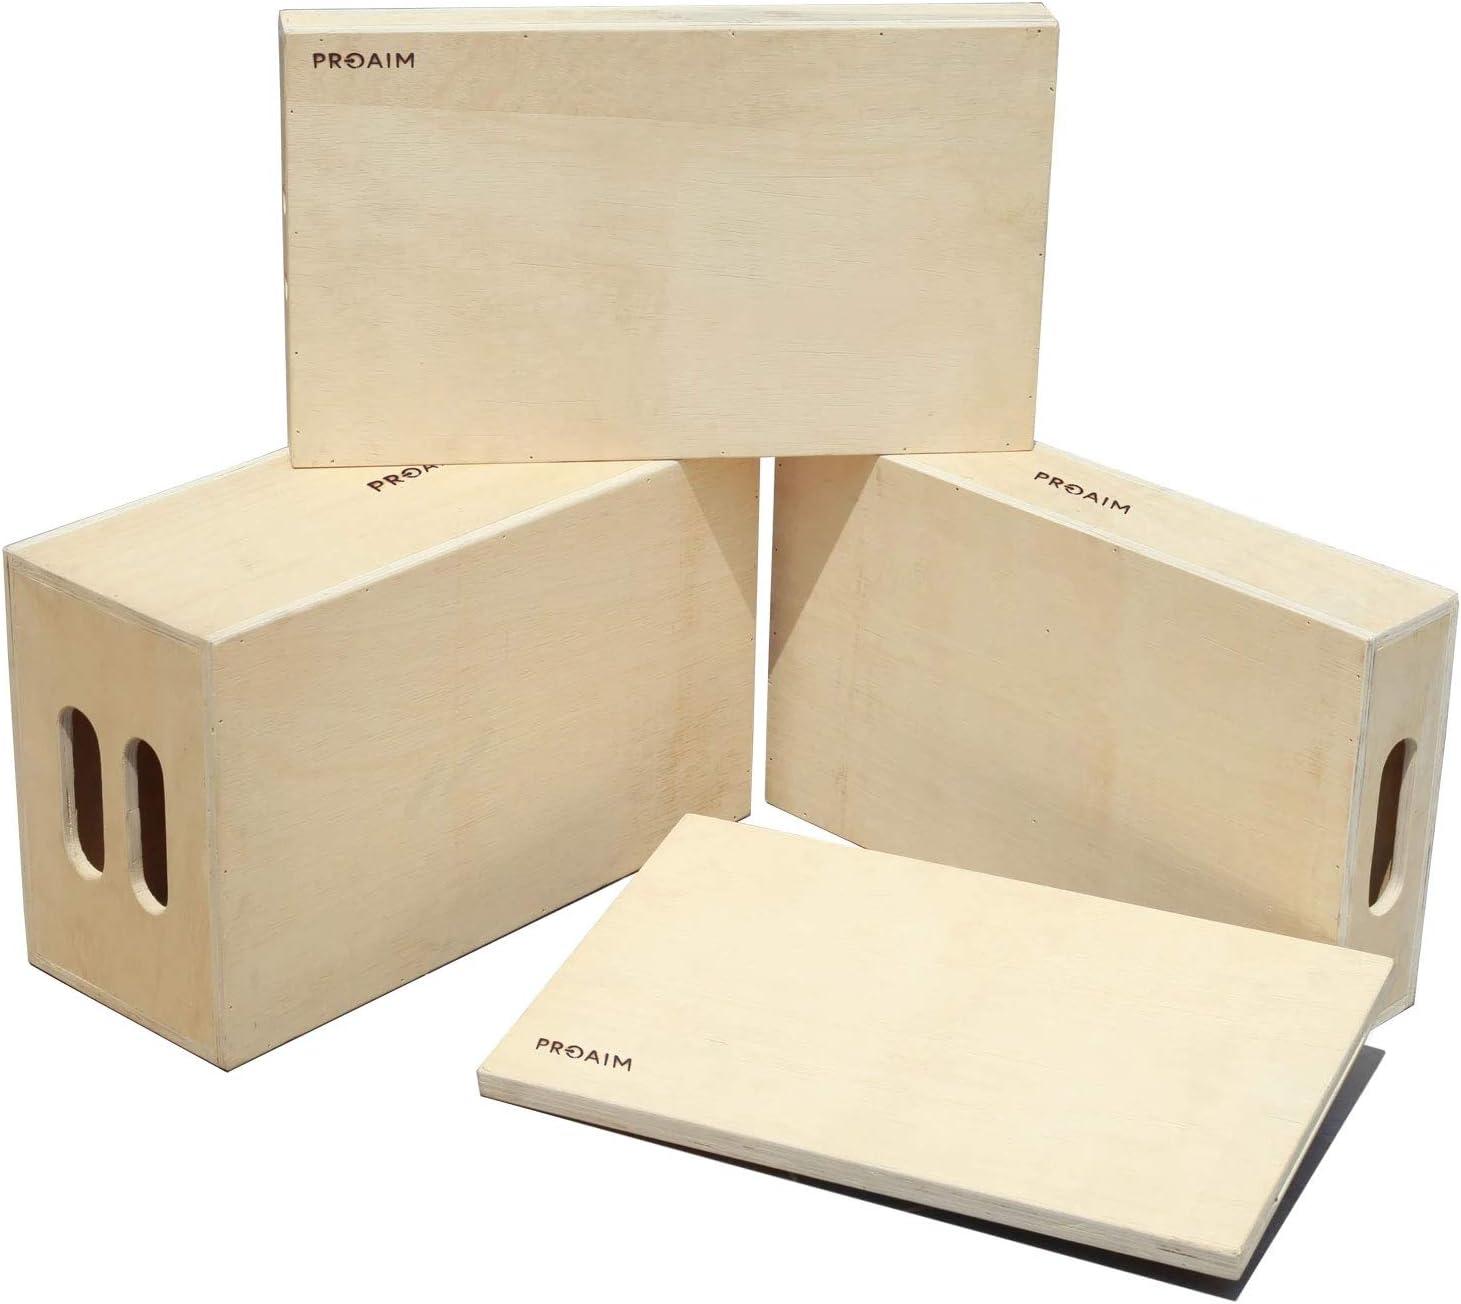 PROAIM Full Set of 4 Standard White Apple Boxes - Multi-Use Wooden Boxes for Studio, Film Set & Photography - Use them for Propping, Leveling, Standing | Full, Half, Quarter & Pancake (AB-SET4-WH)